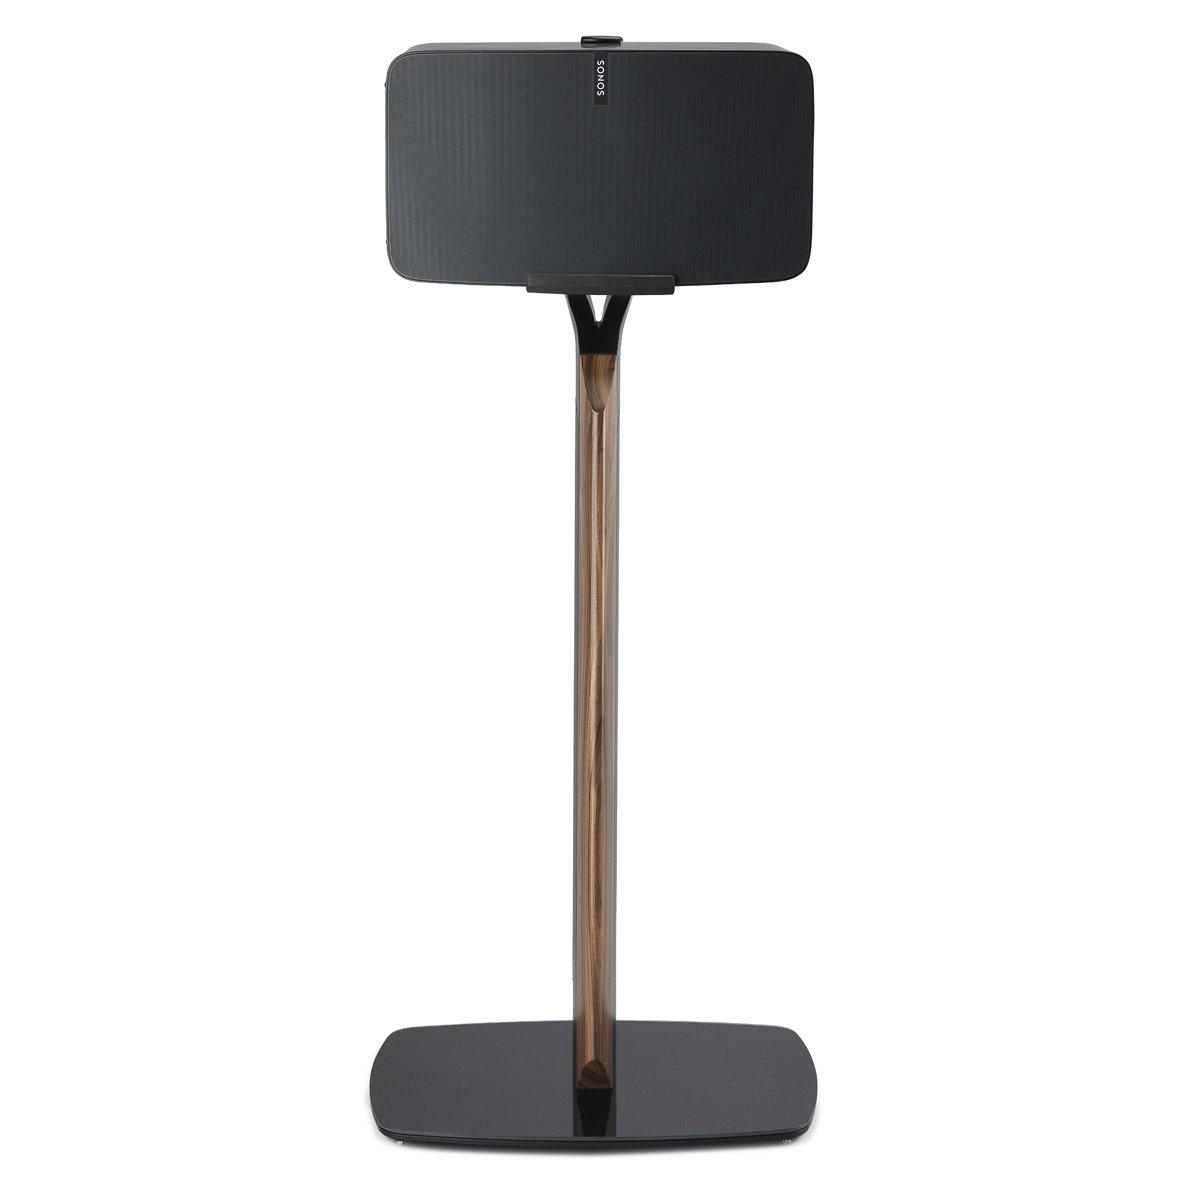 Flexson Premium Floor Stand for Sonos PLAY:5 (Black Walnut) by Flexson